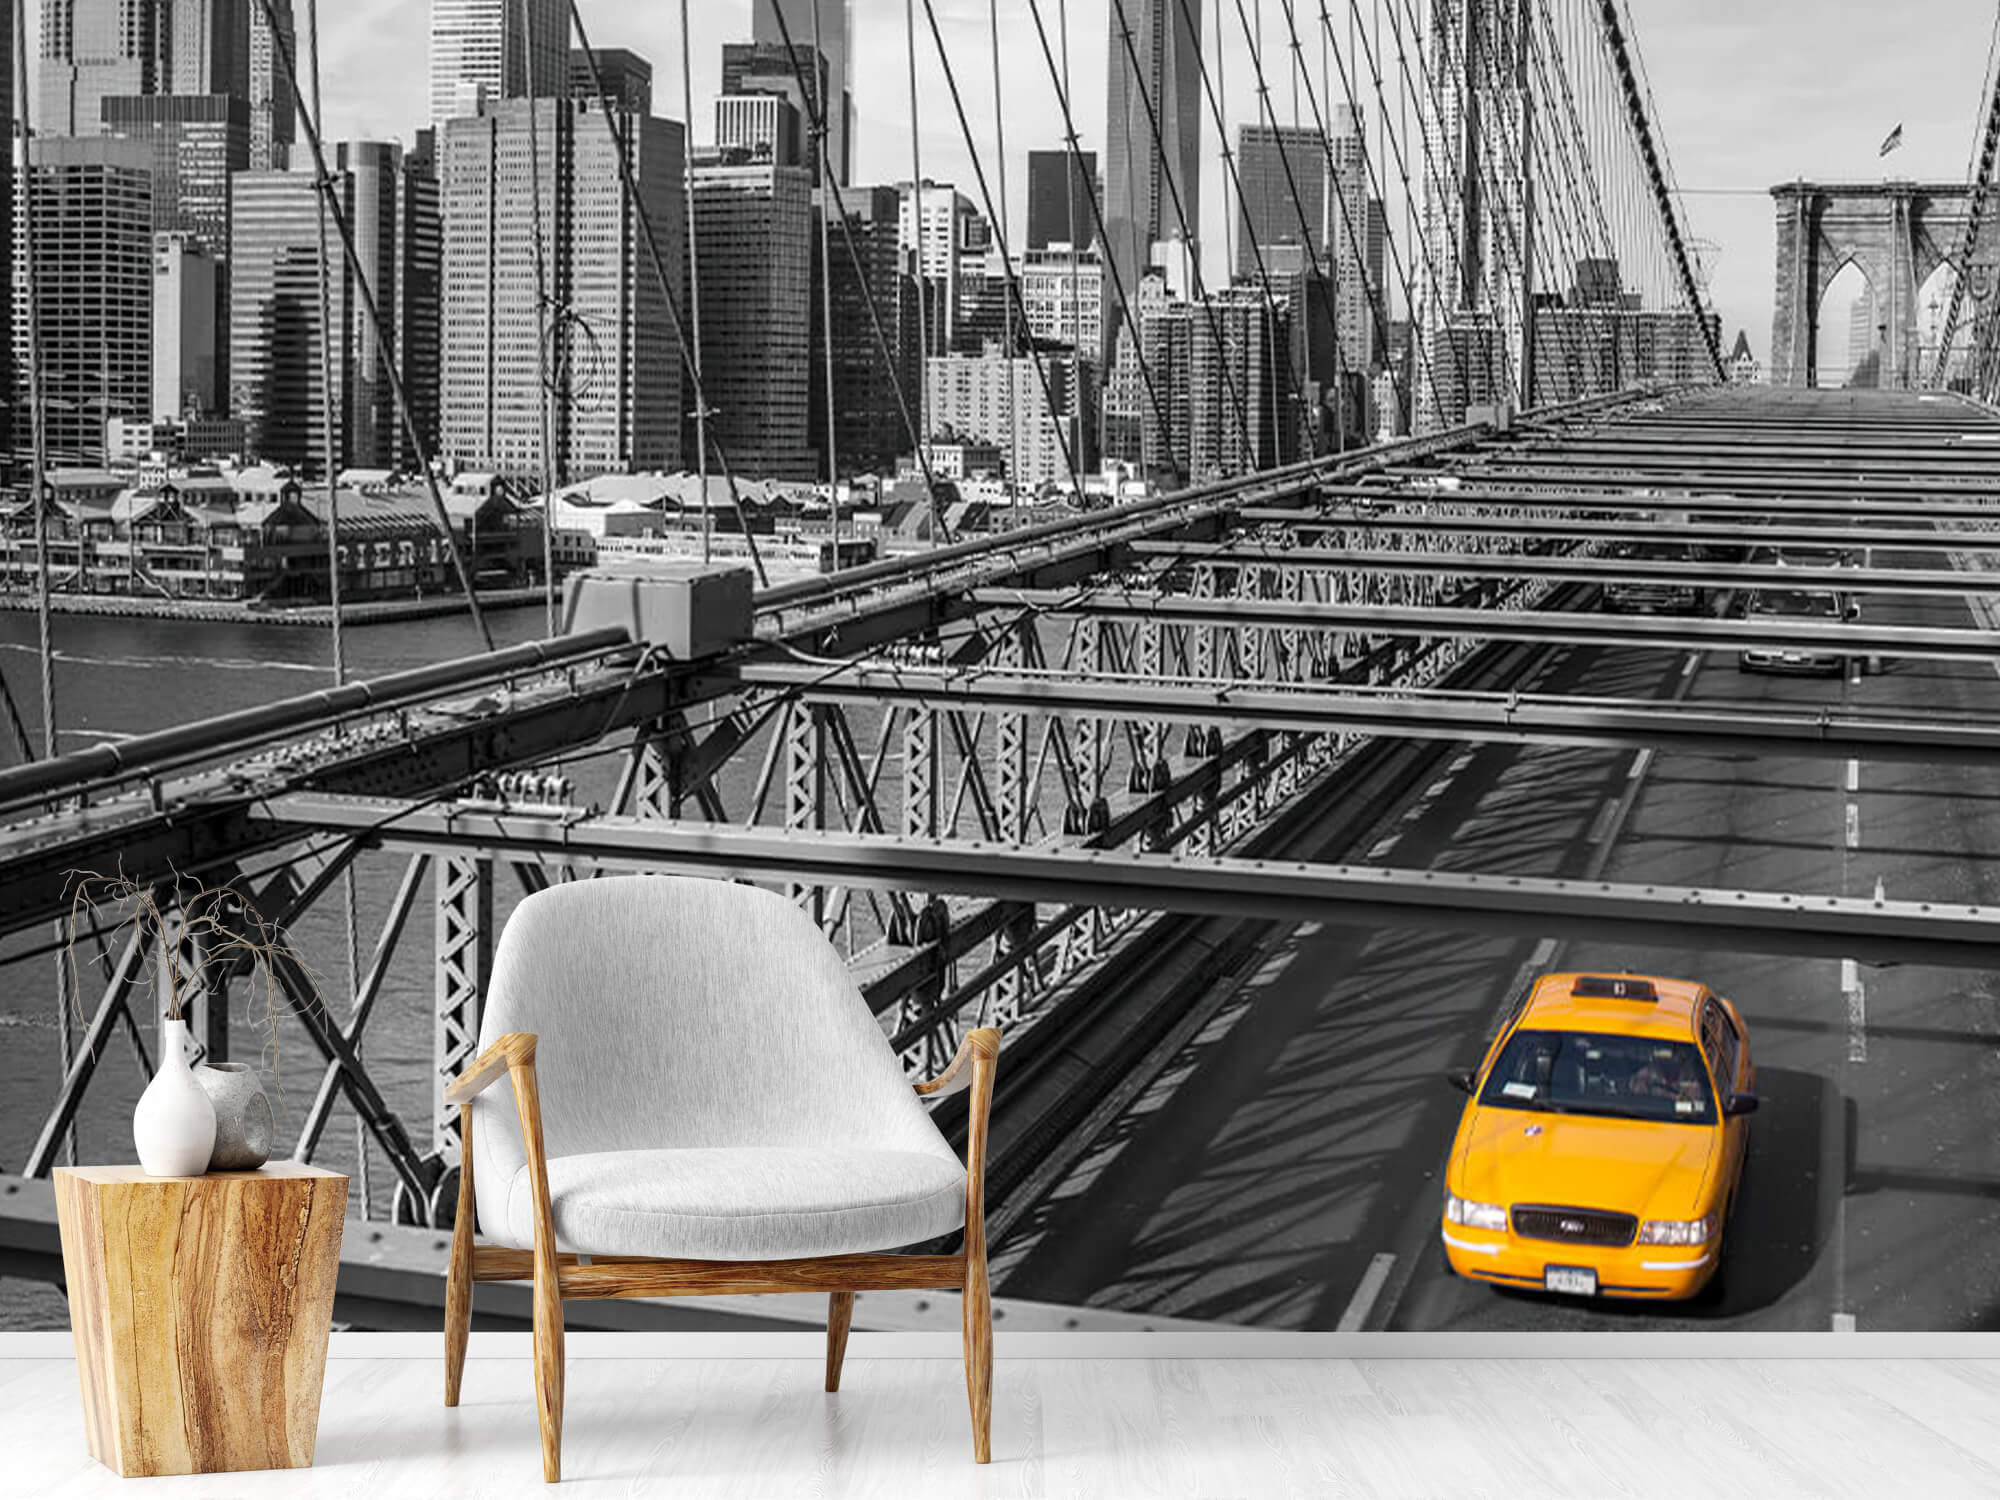 Un taxi sur le pont de Brooklyn 2